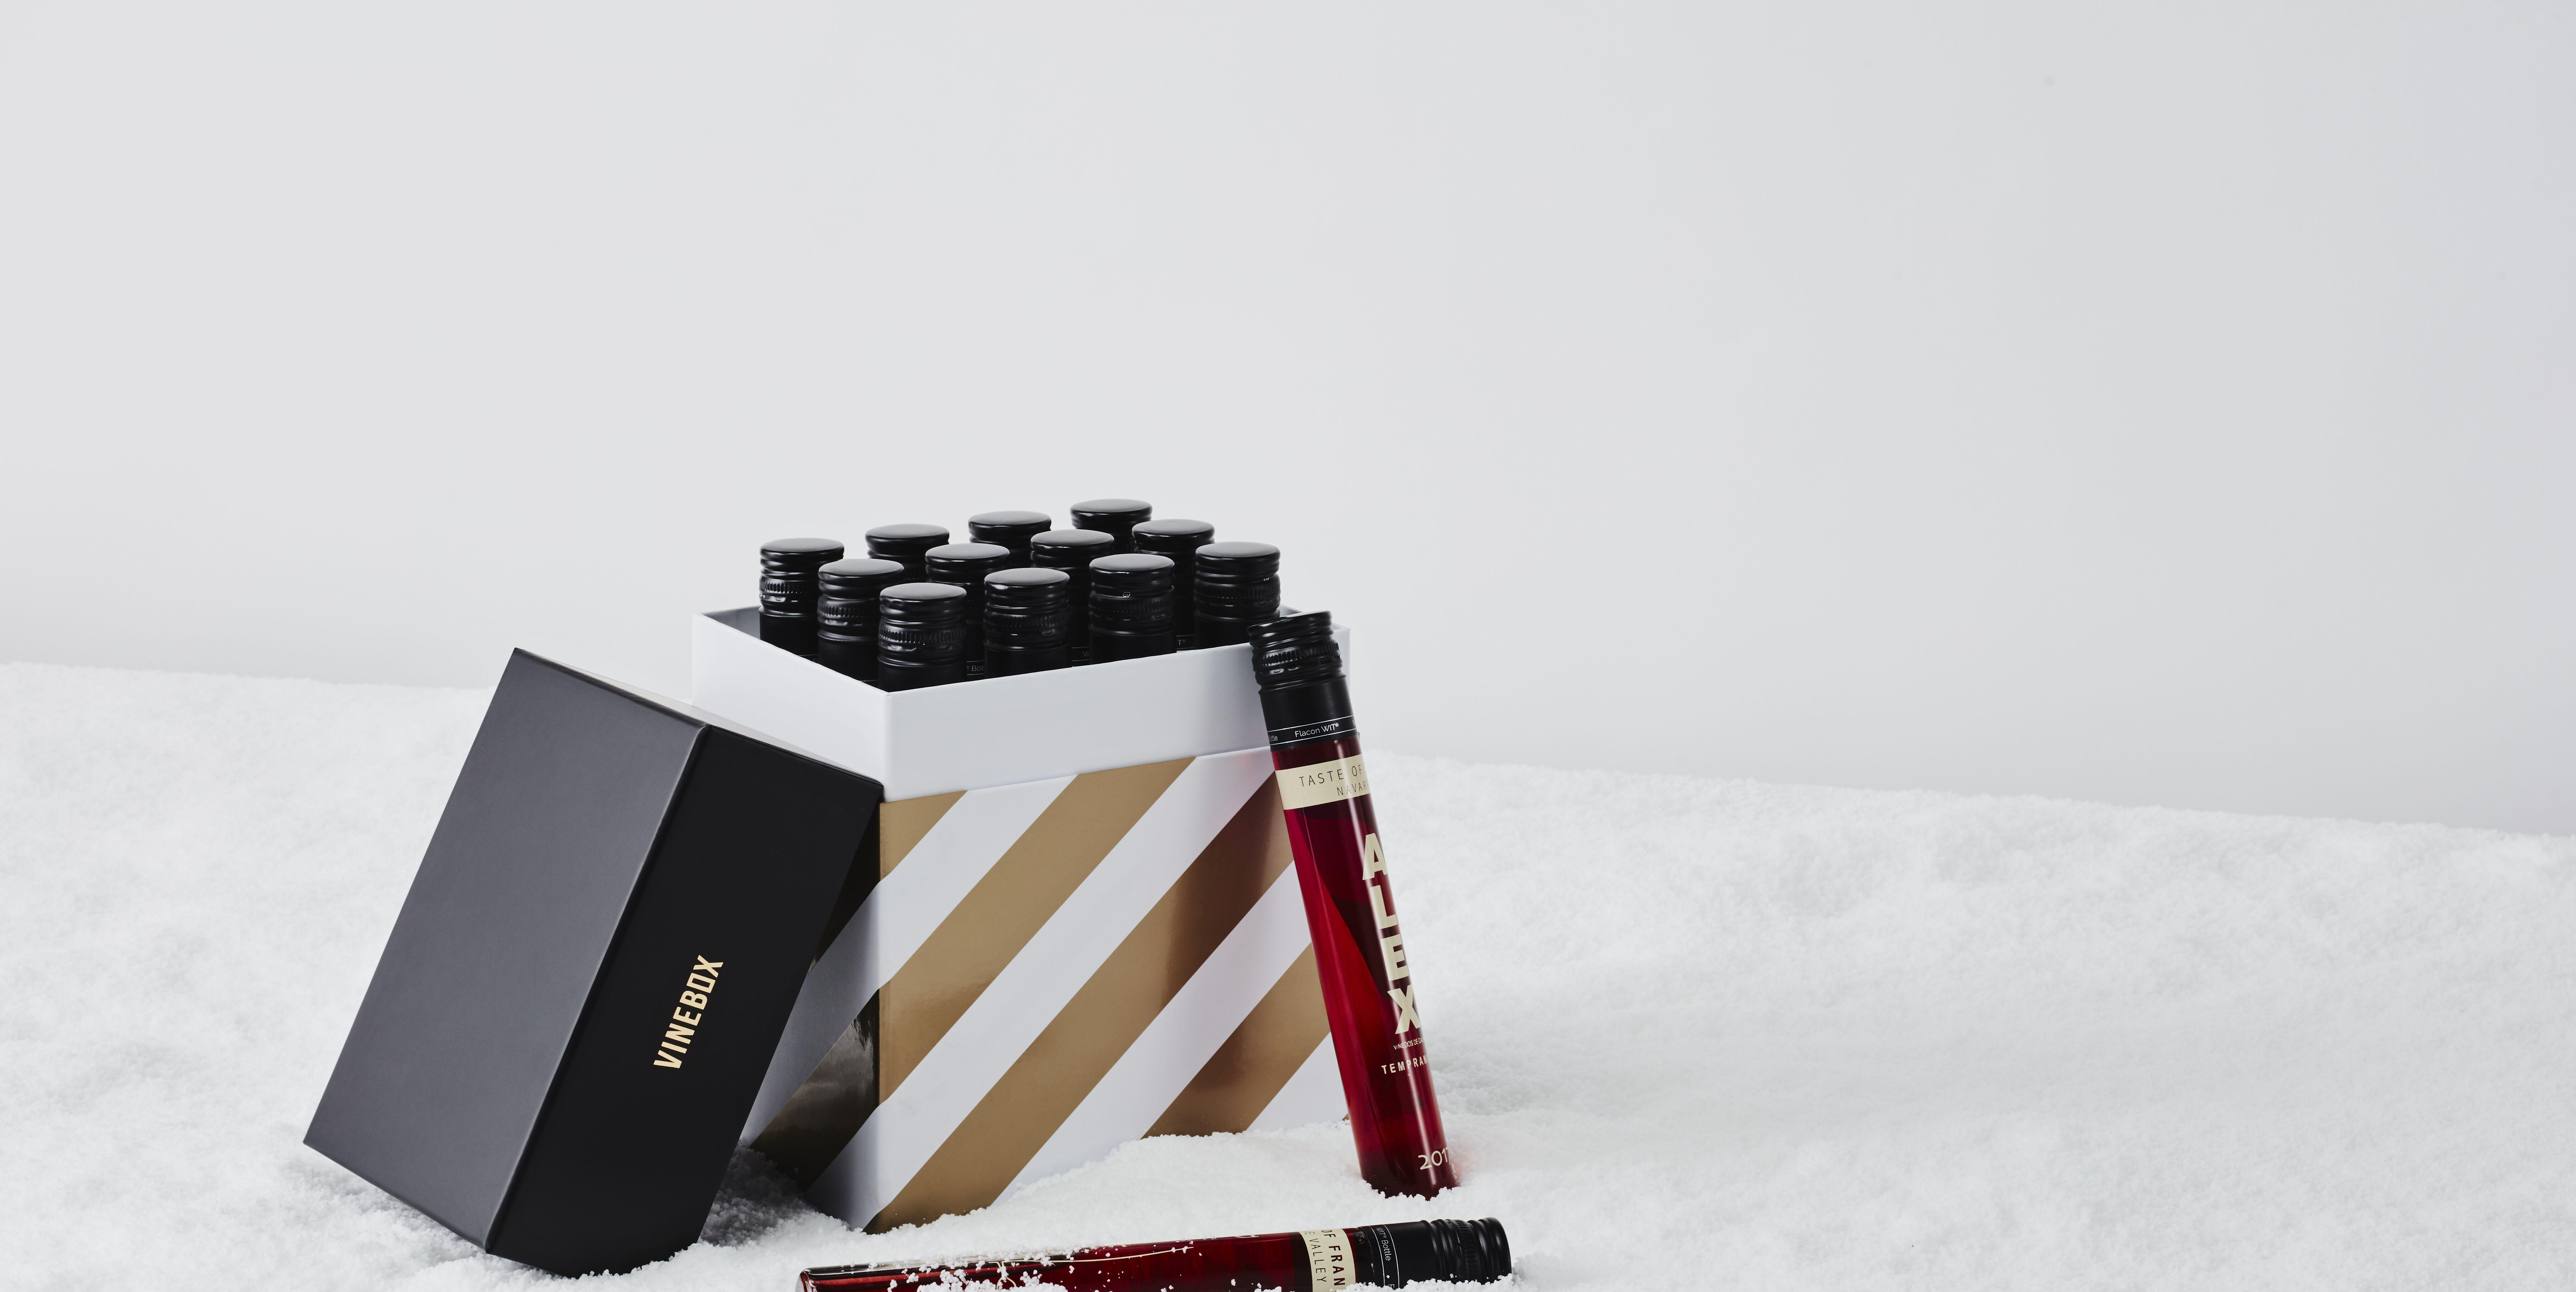 Vinebox Is Bringing Back Its 12 Days Of Wine Box